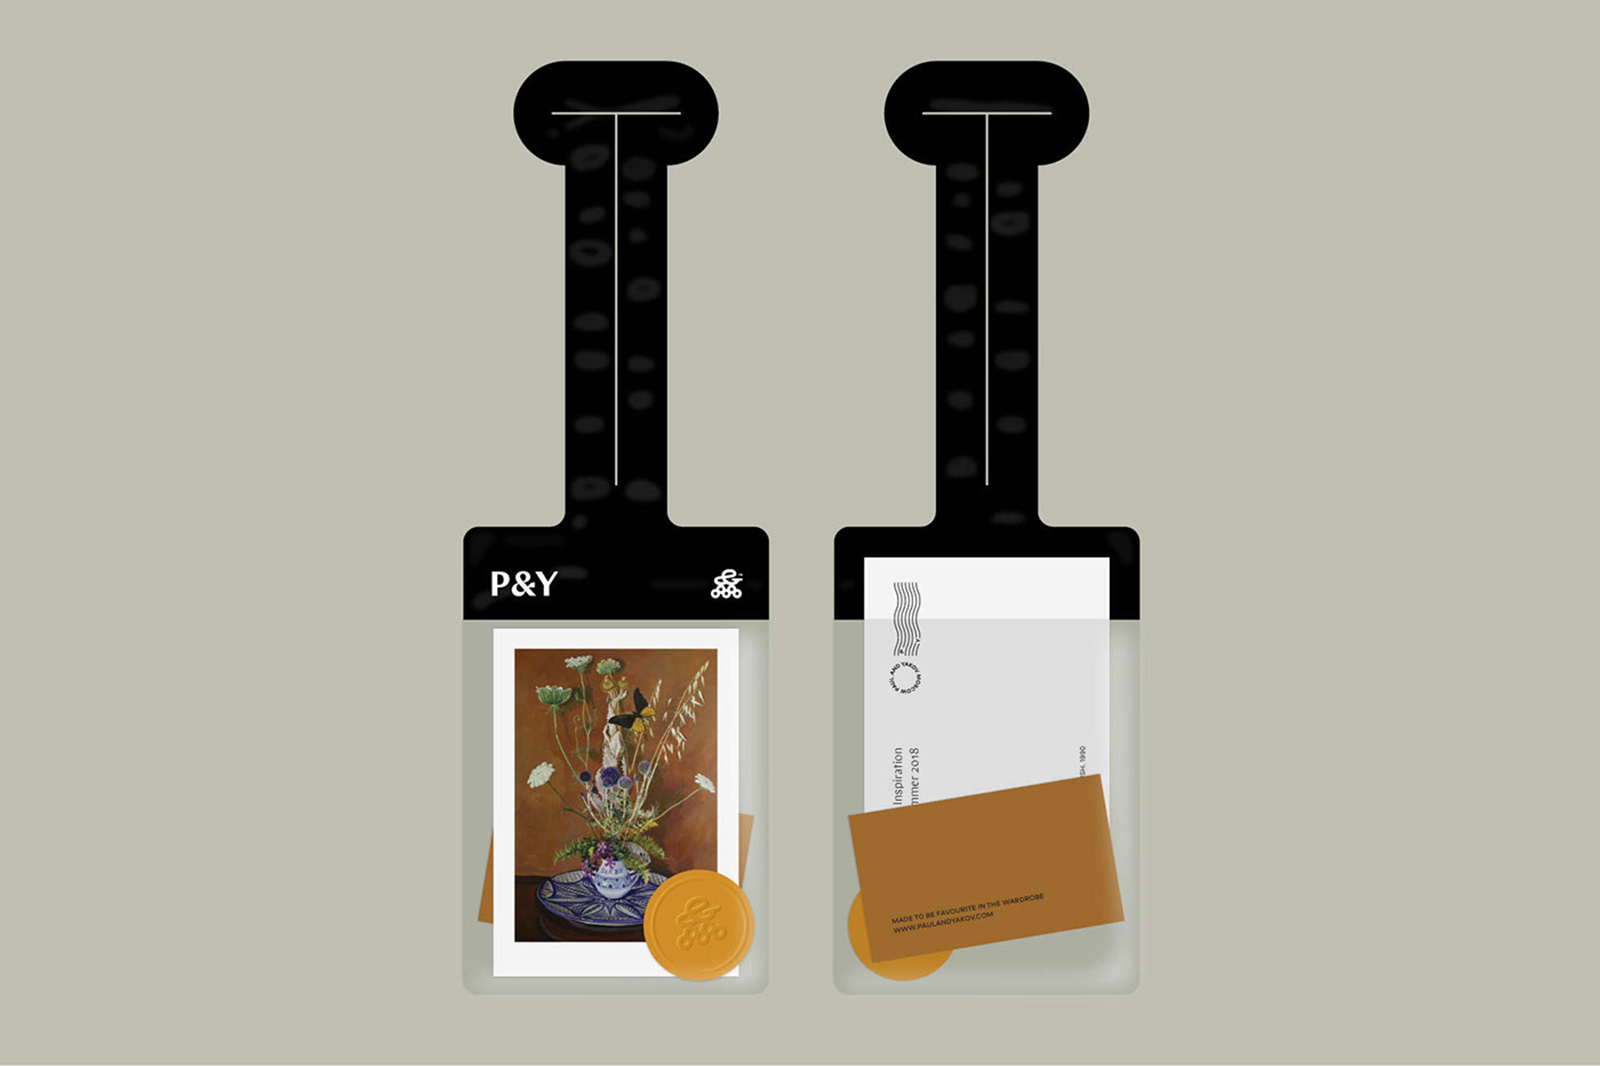 Paul & Yakov 时装品牌视觉VI形象设计欣赏-深圳VI设计15